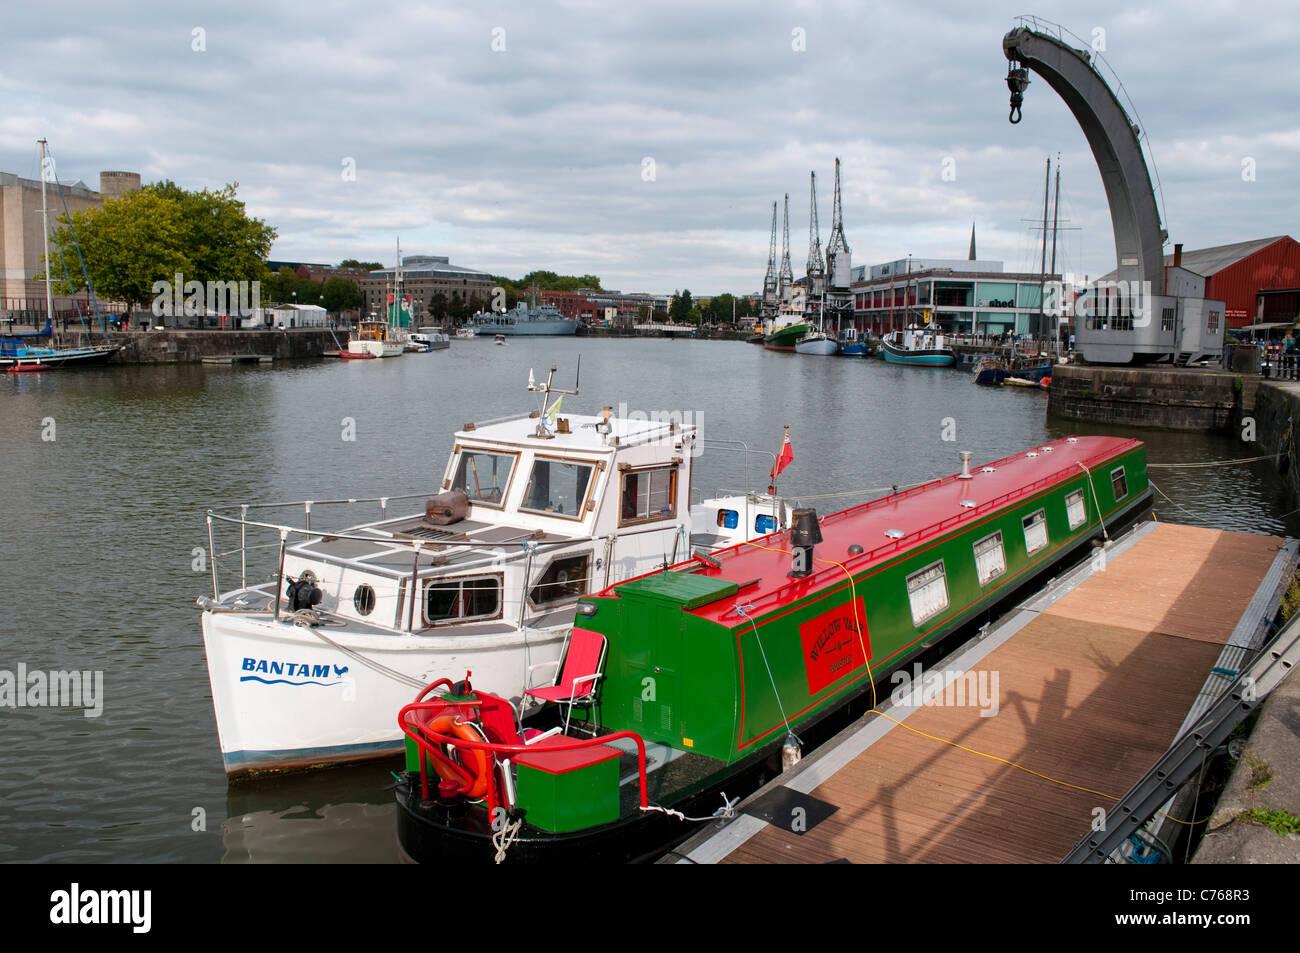 Bristol Harbour Railway, Bristol, England, United Kingdom - Stock Image